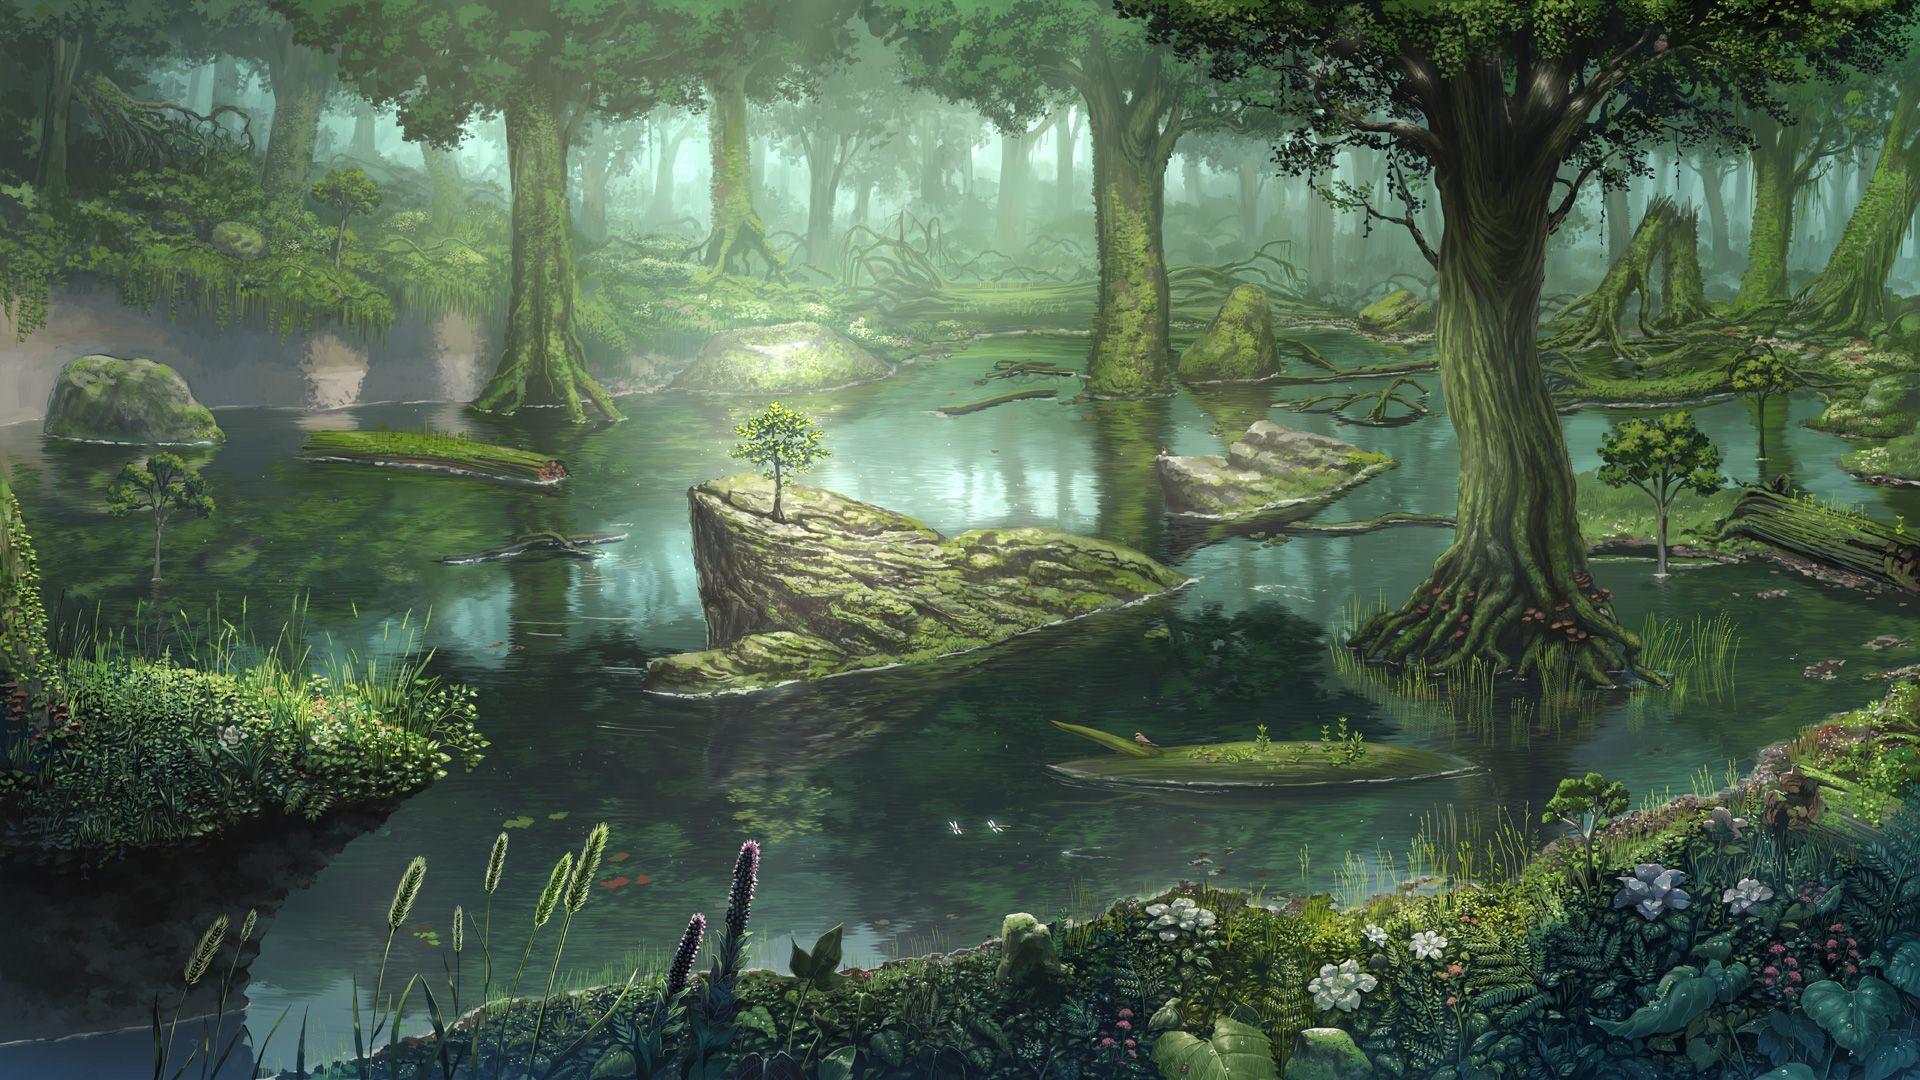 Fantasy Swamp Forest Wallpaper